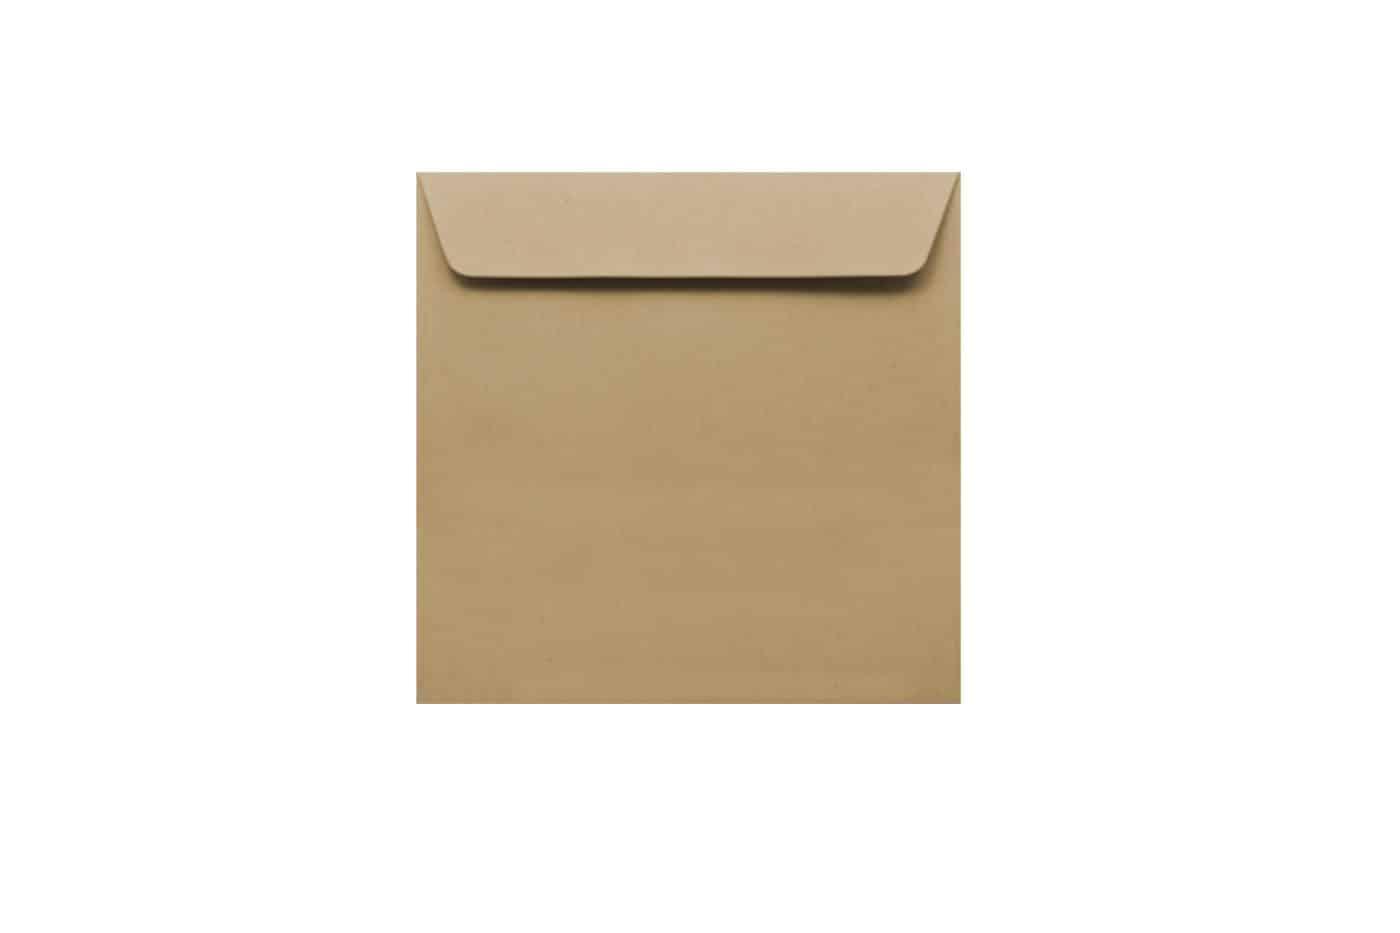 150mm x 150mm Kraft envelopes